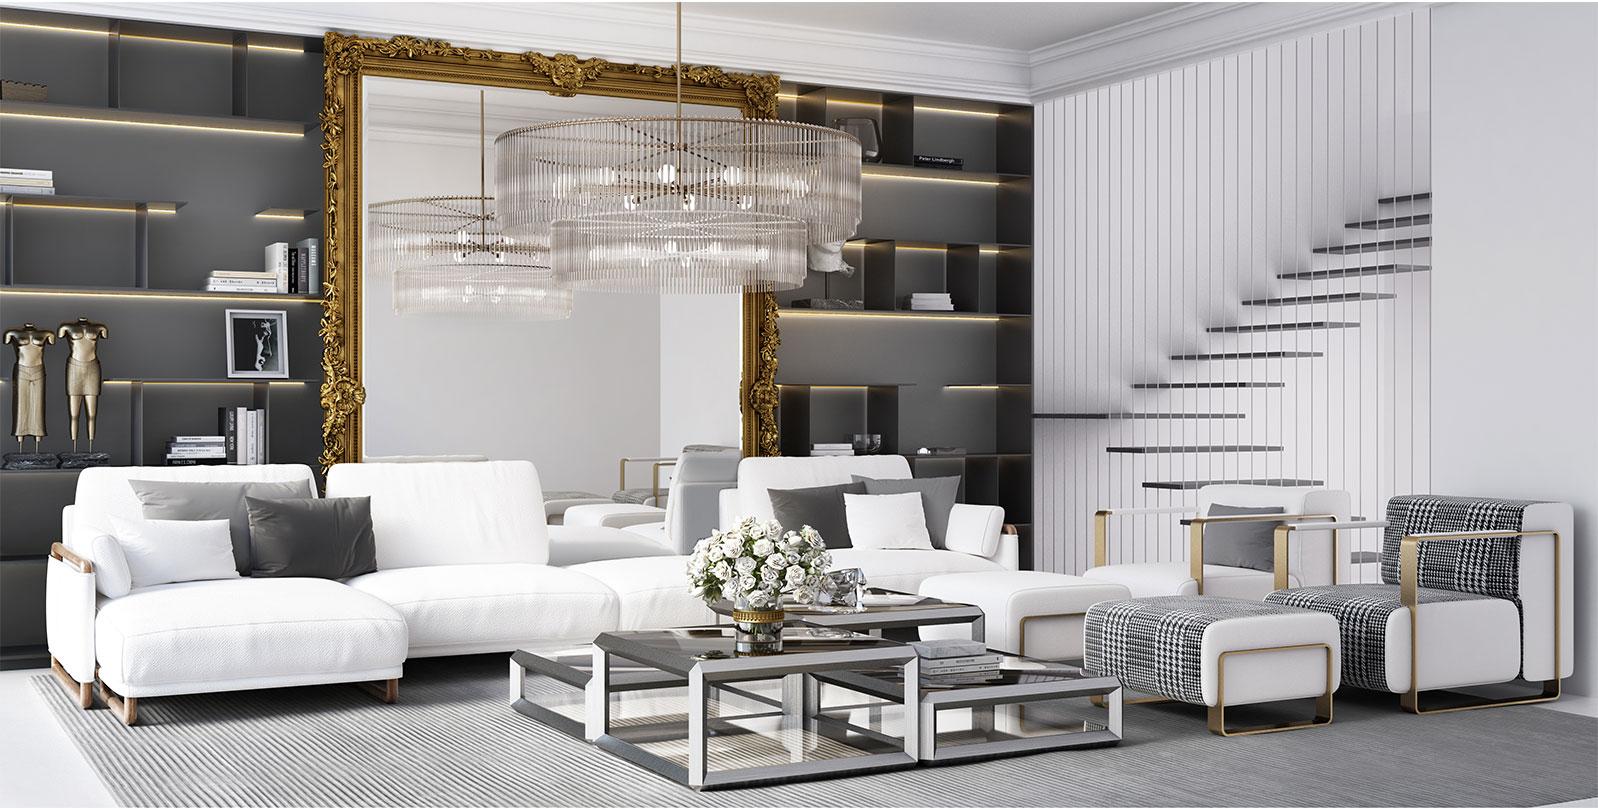 Decor Beverly Hills living room rendering